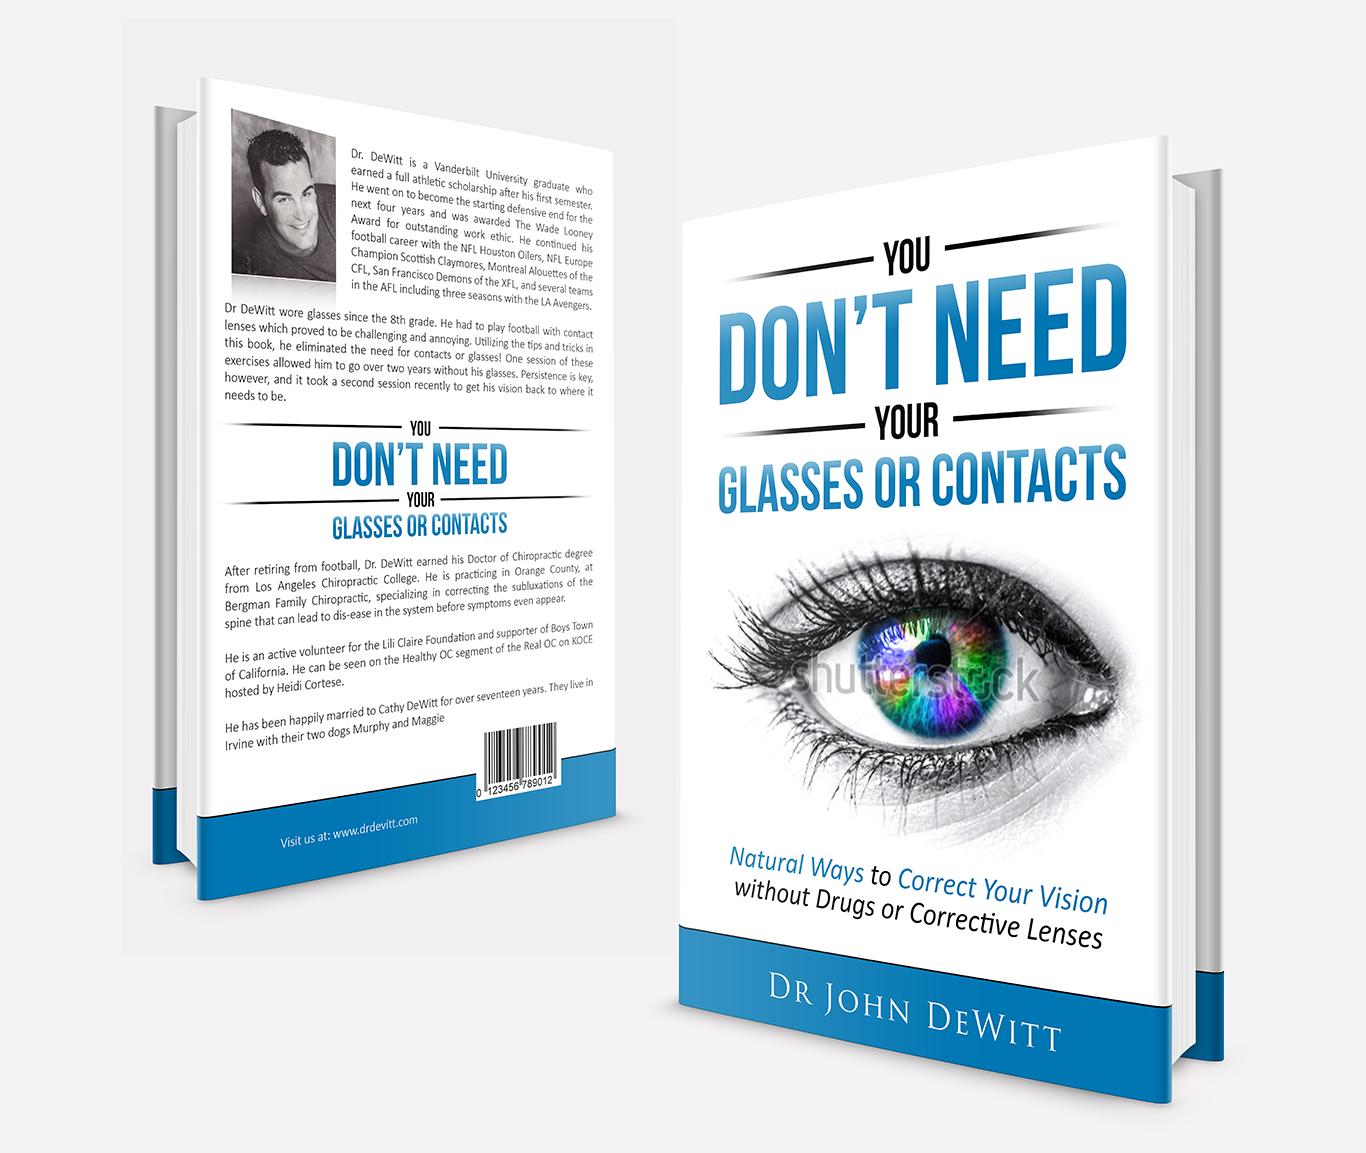 Natural Vision Correction Book Cover!